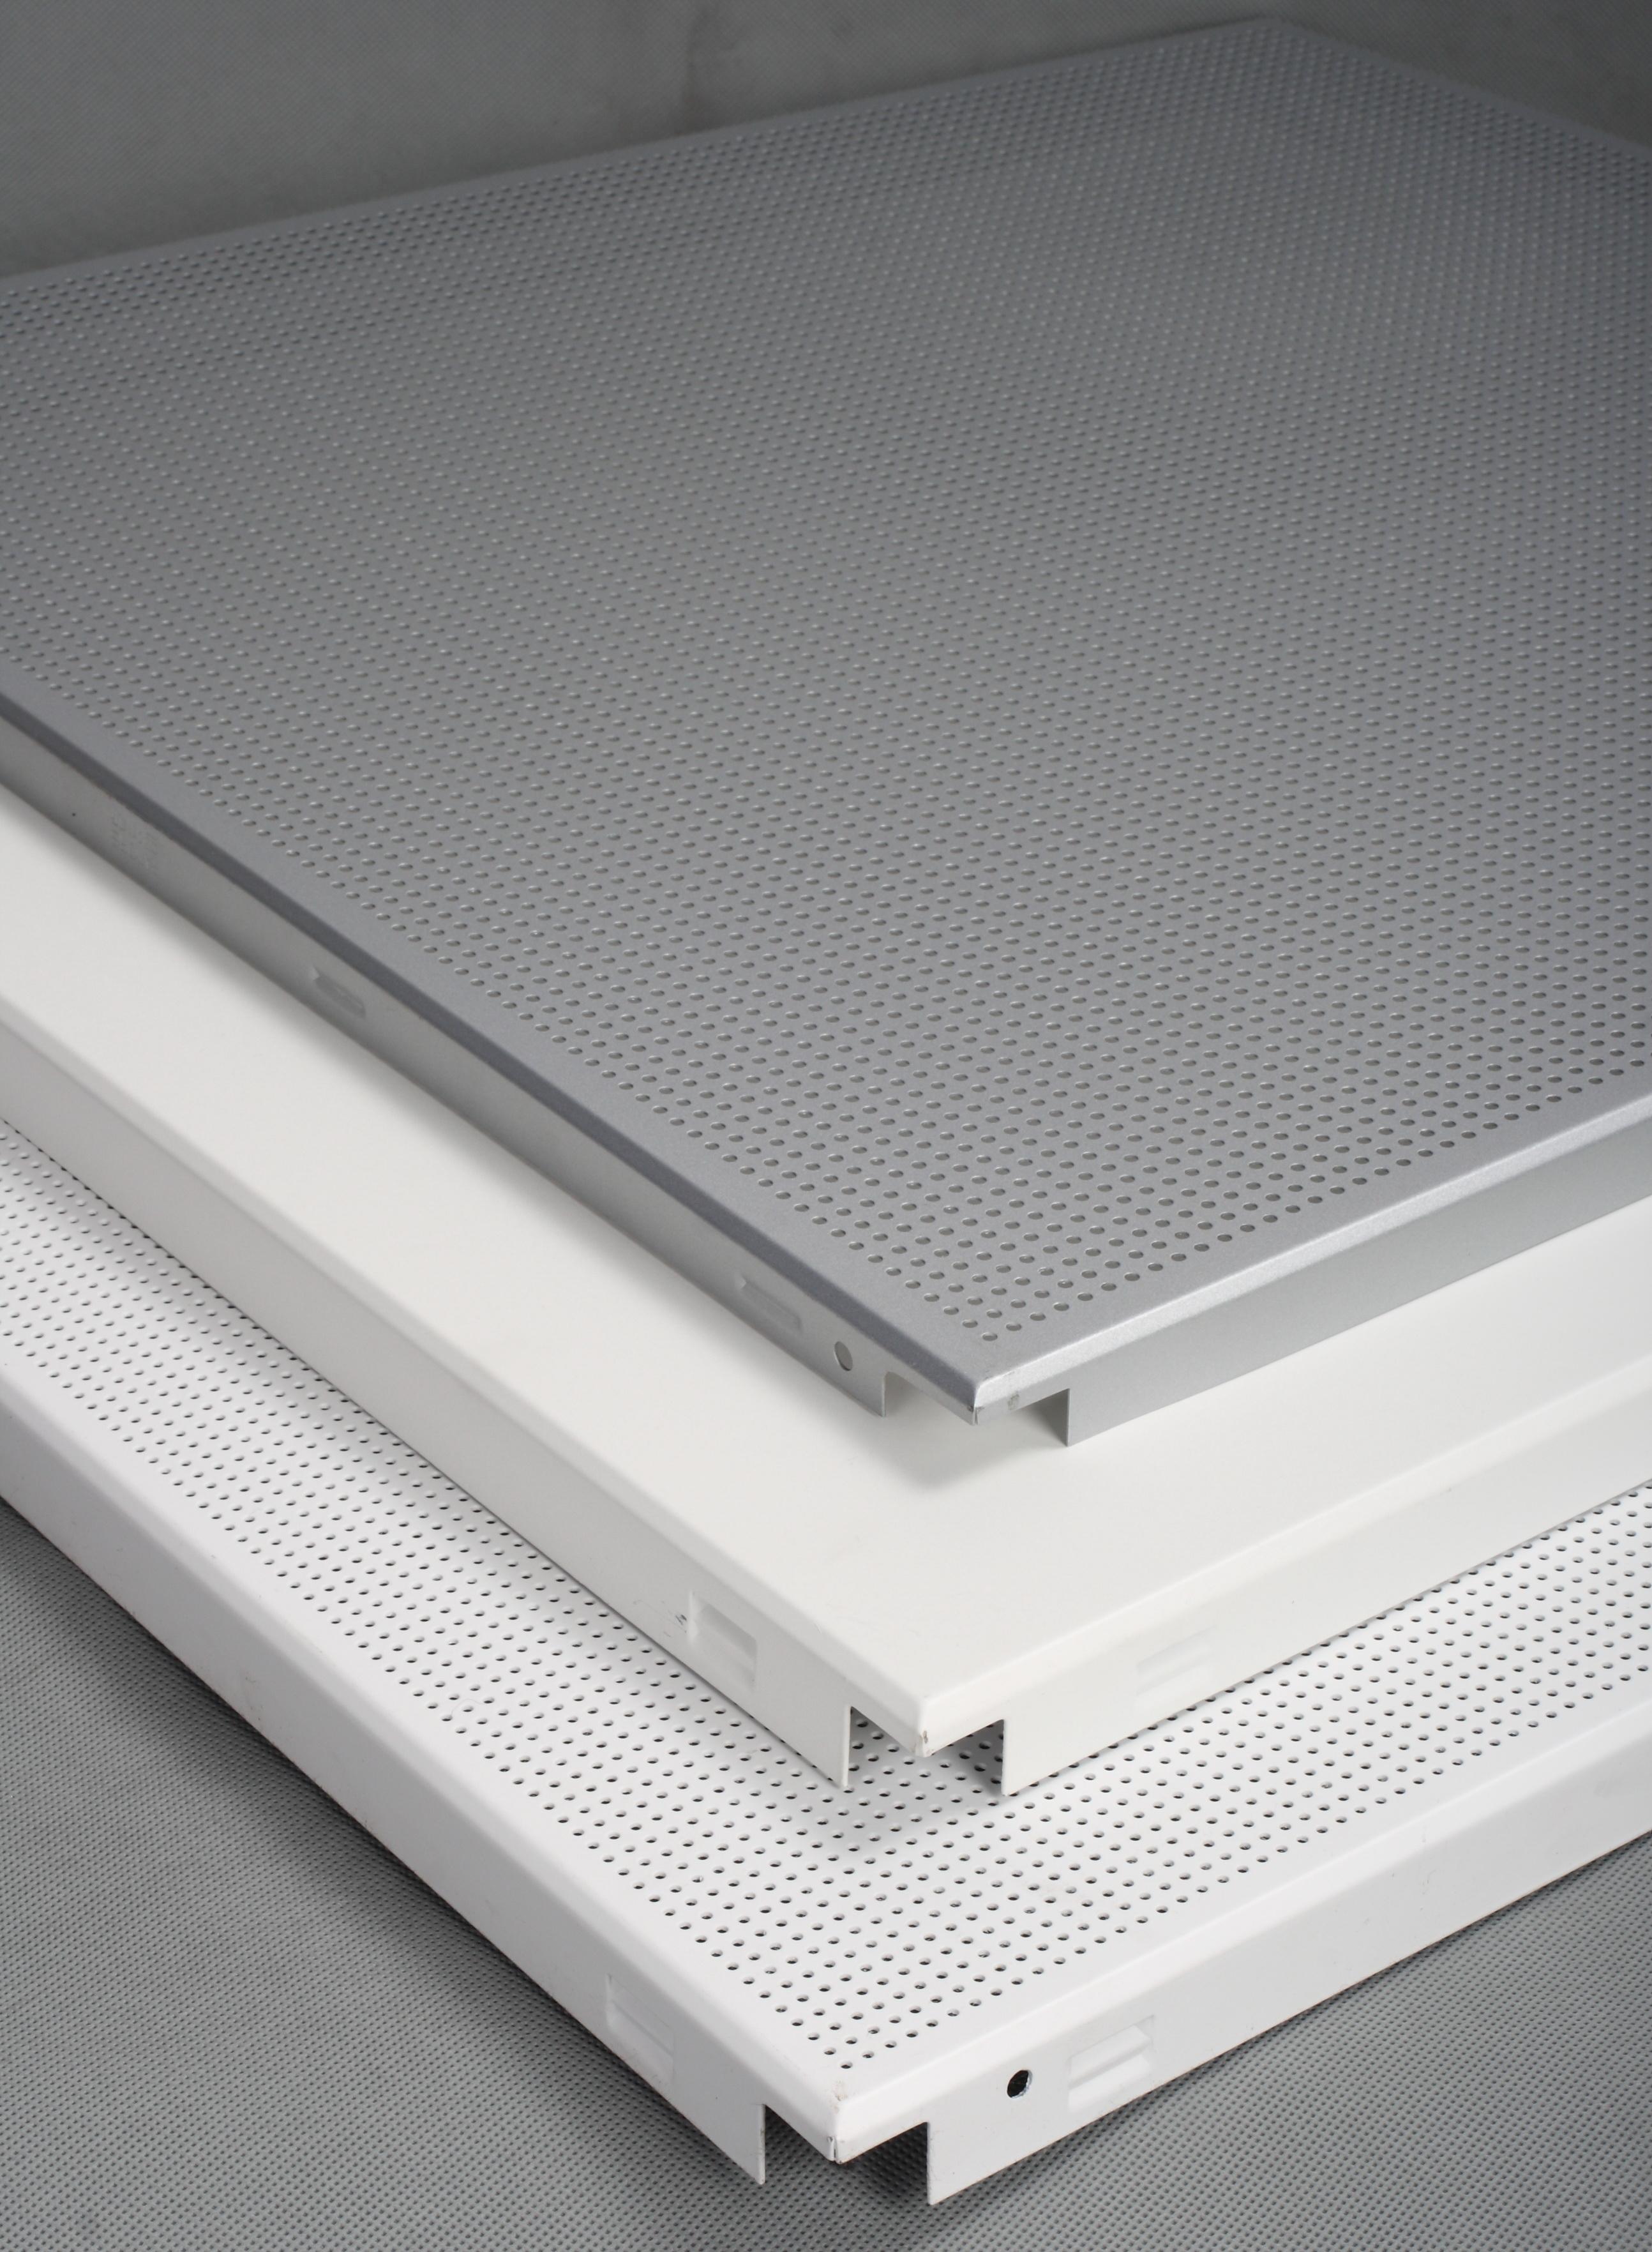 Buy Sqaure Clip In Snap In Aluminum False Ceiling Tiles